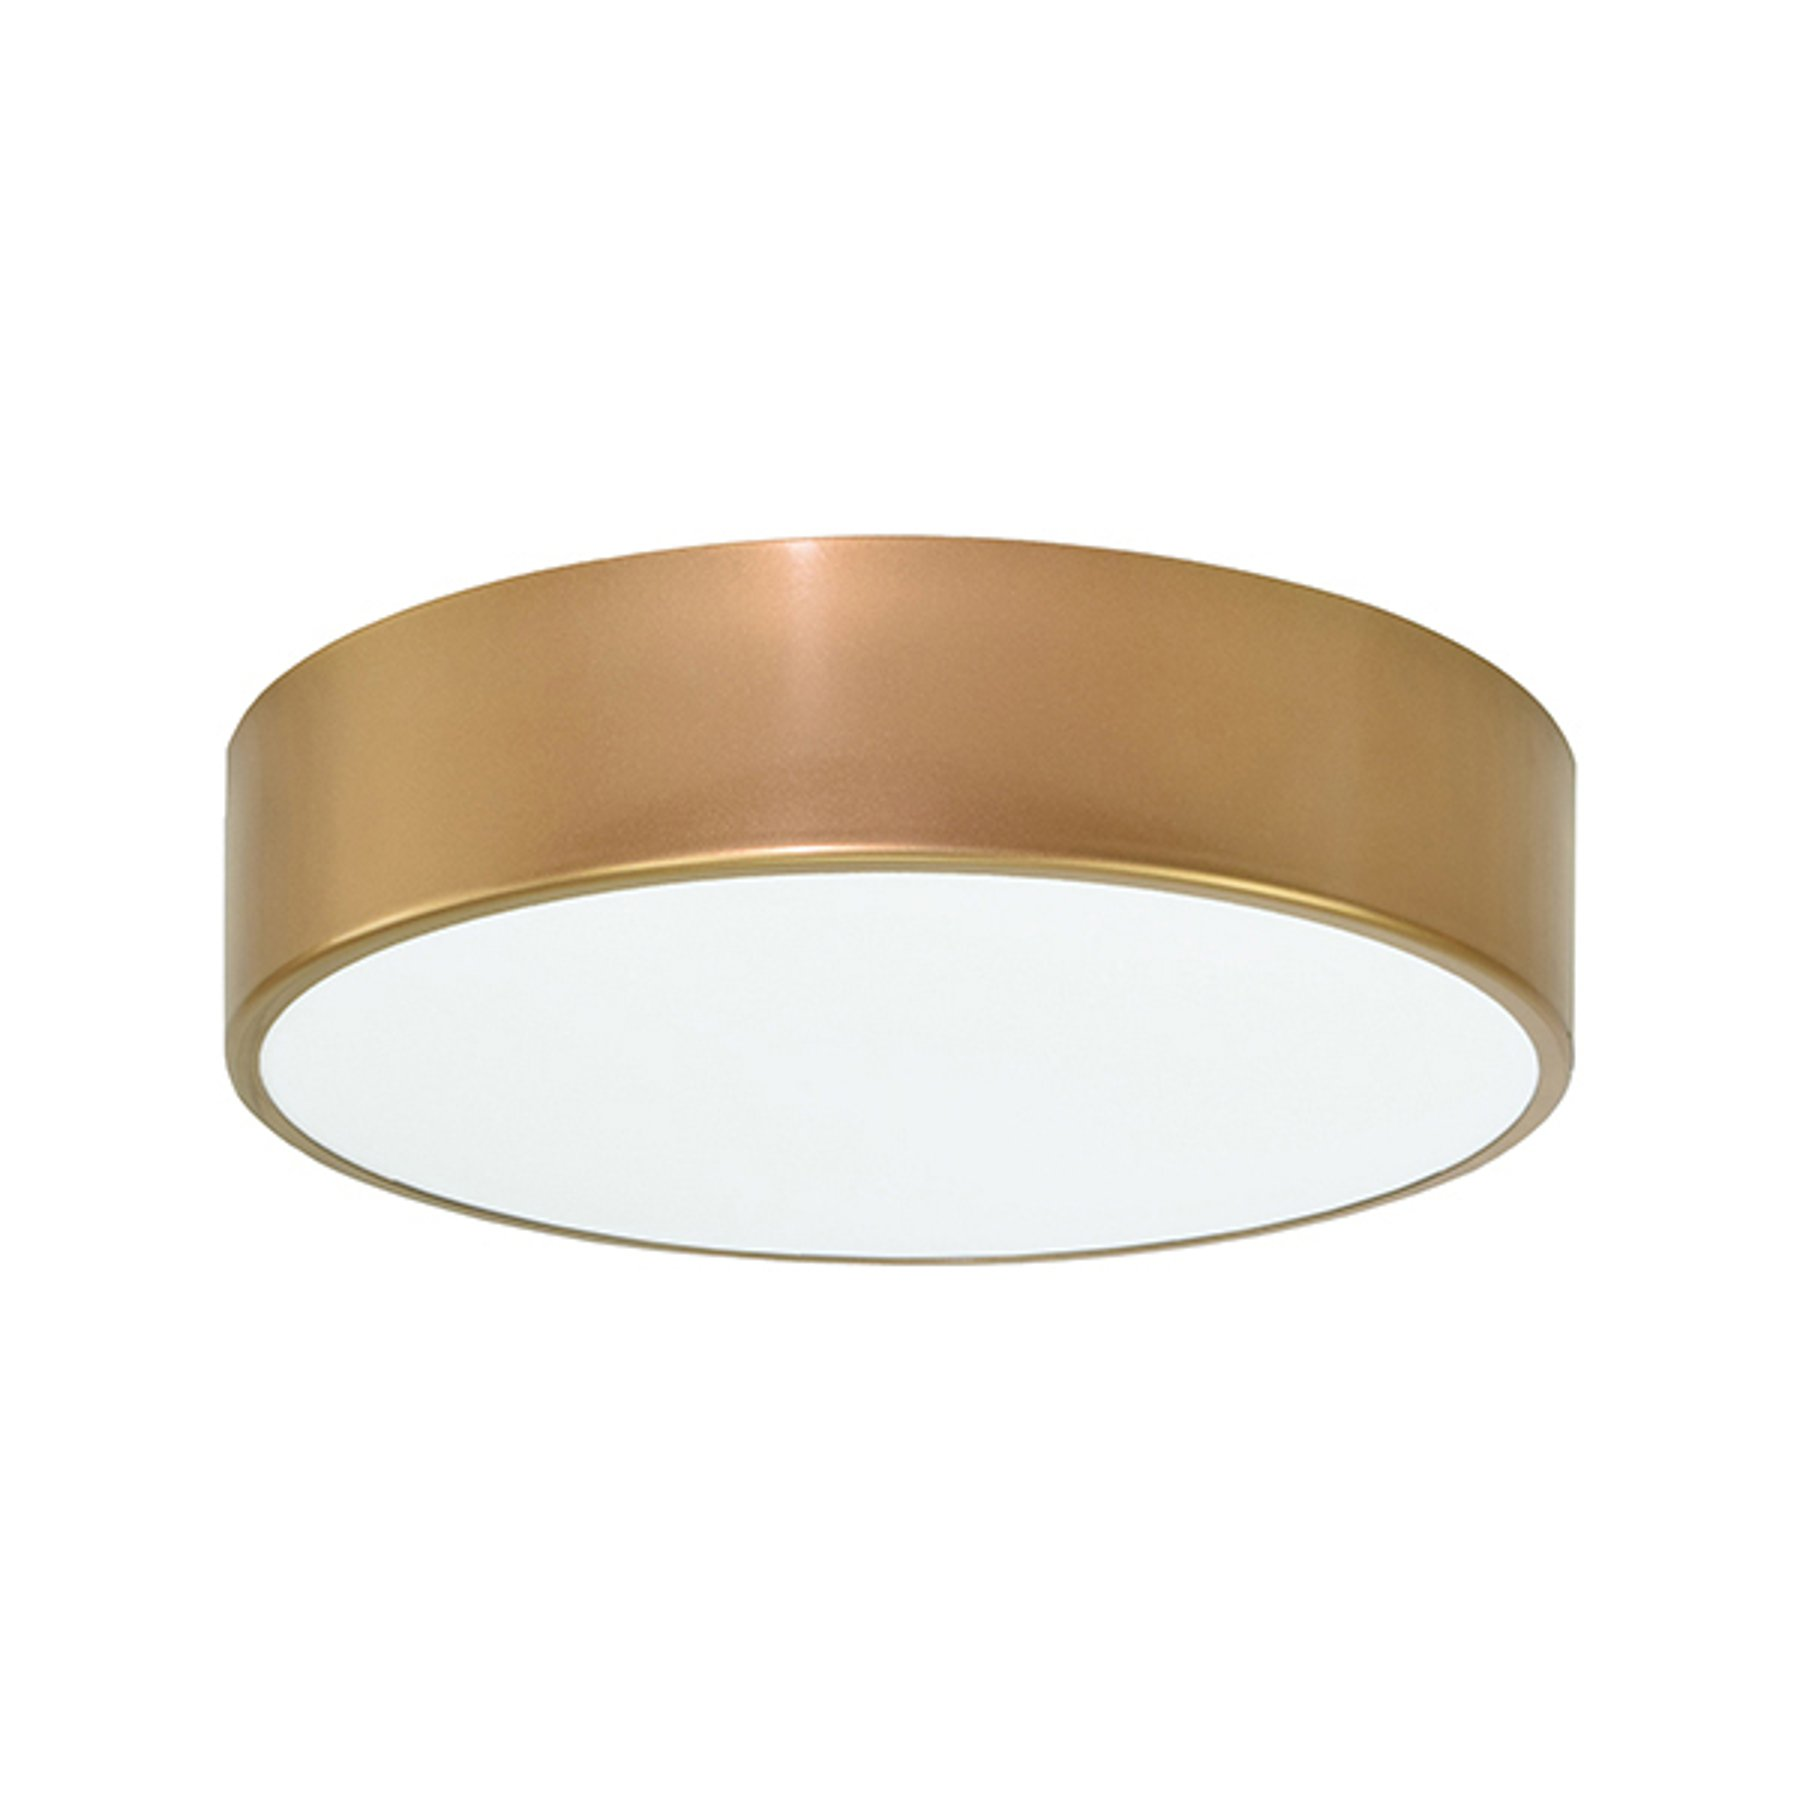 Taklampe Cleo Ø 30 cm, gull